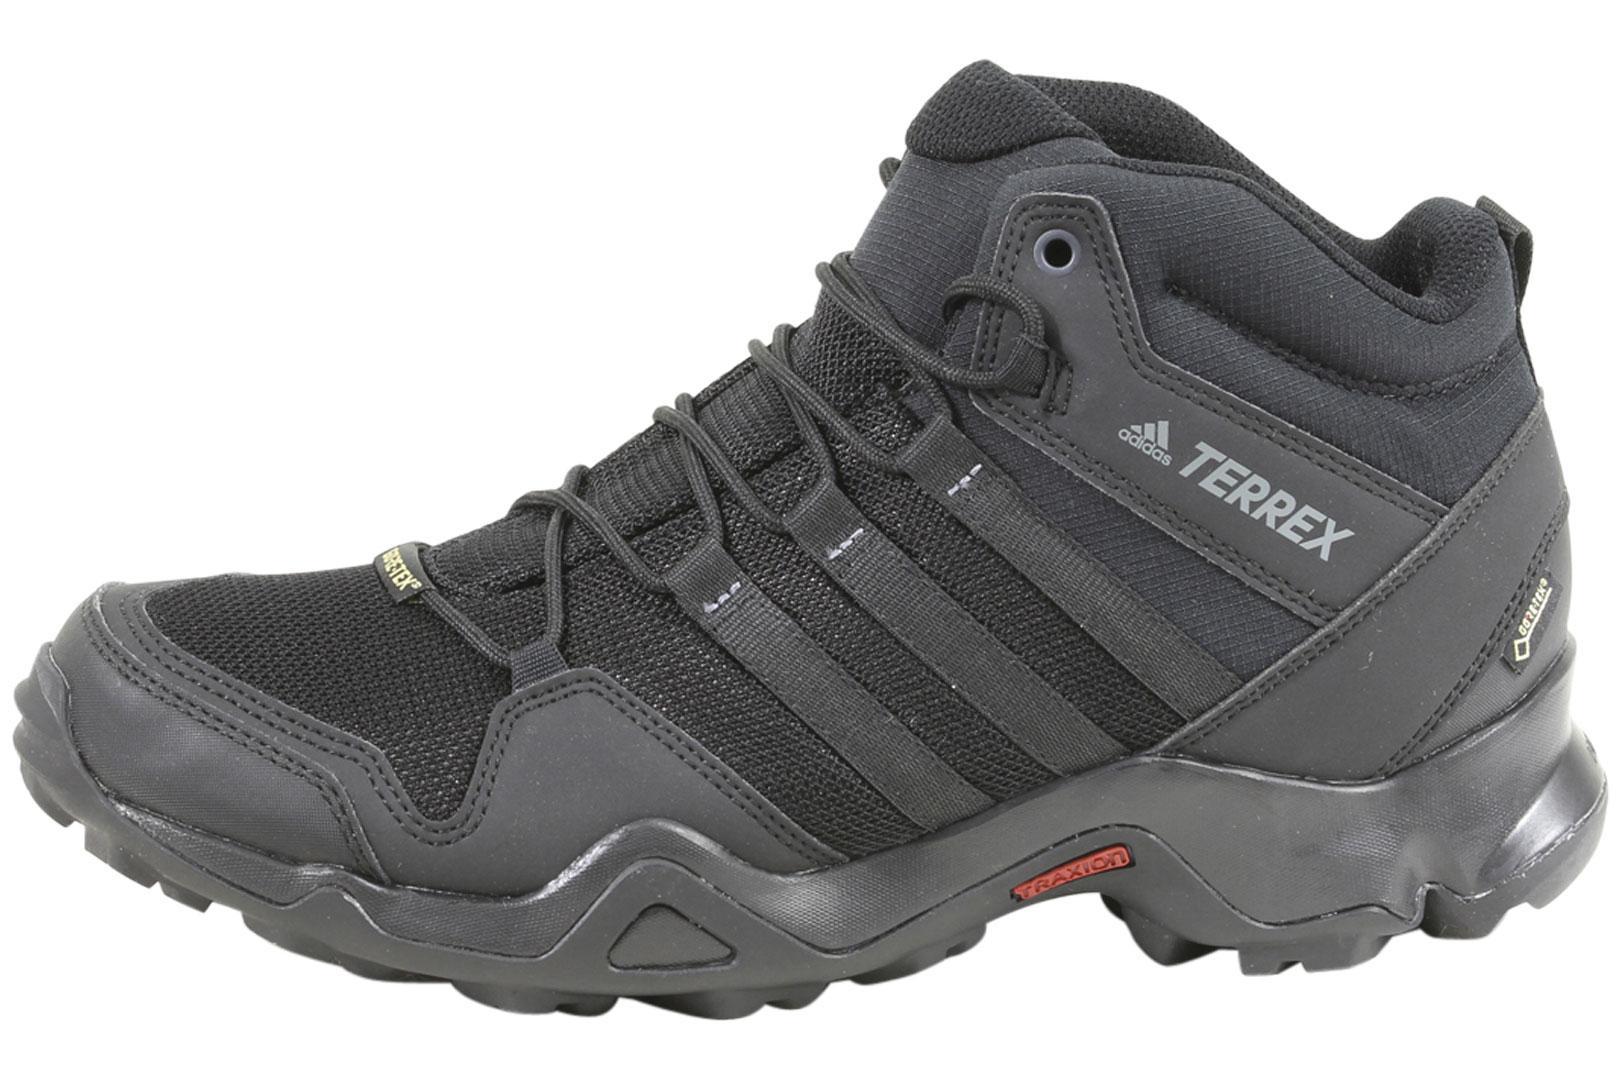 Adidas Men's Terrex AX2R Mid GTX Hiking Sneakers Shoes